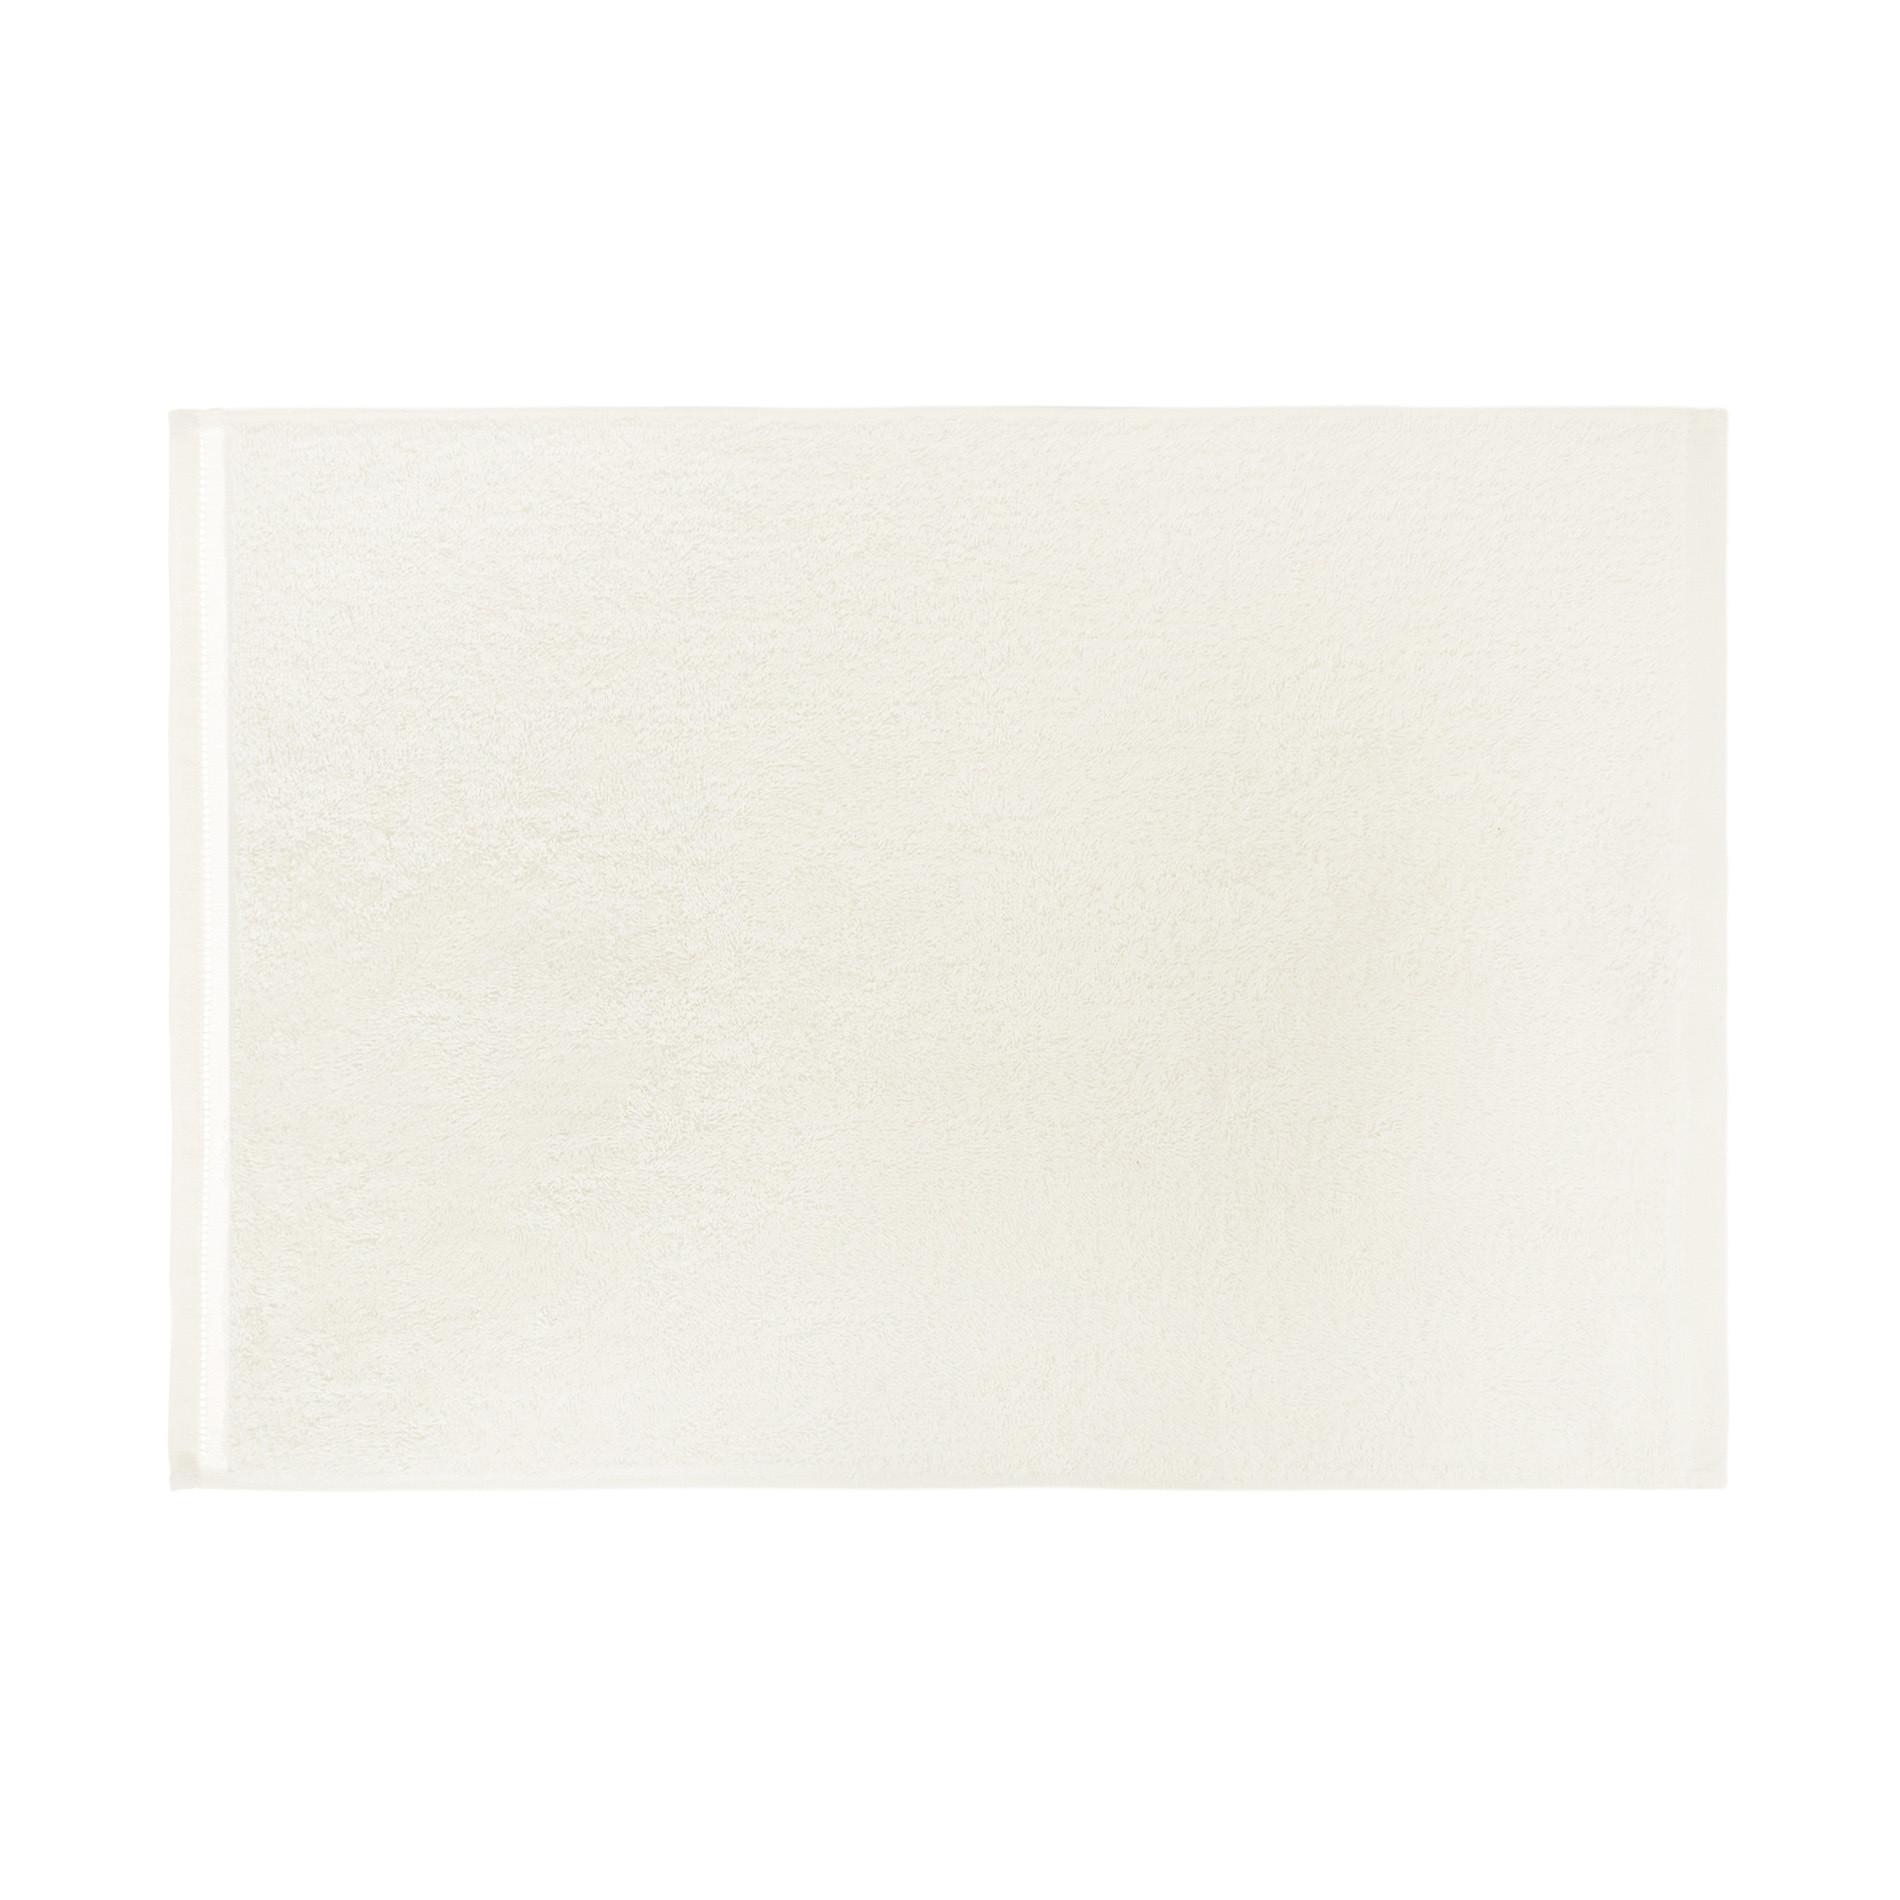 Set 2 asciugamani cotone biologico tinta unita, Bianco, large image number 2